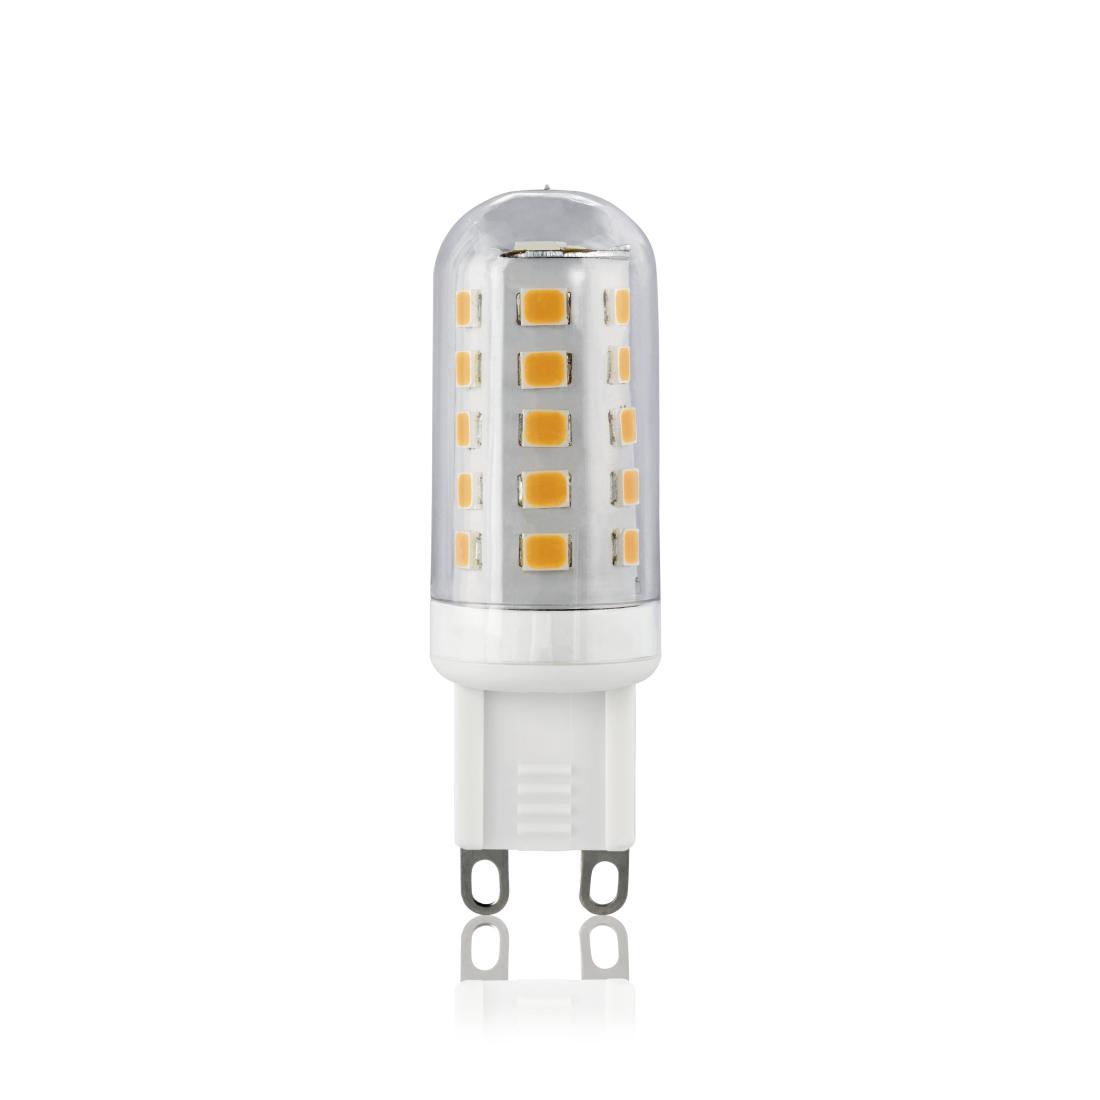 230V Halogen 2000h E27 Eco Xavax 28W 370 Lumen Glühbirn 2750K warm white